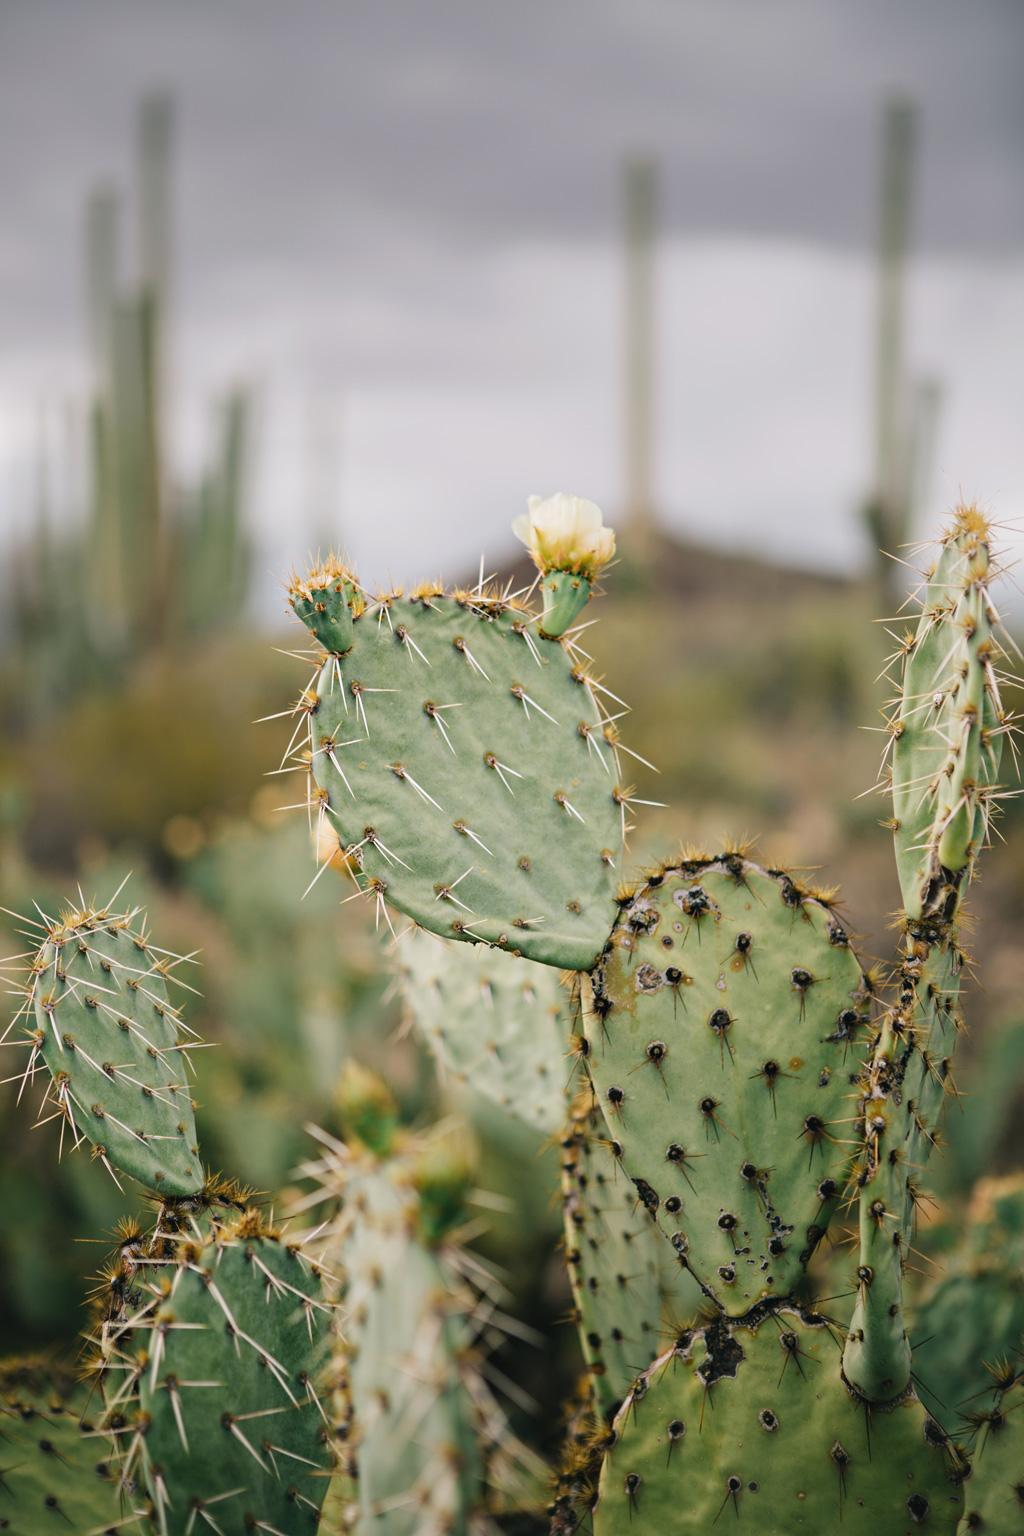 CindyGiovagnoli_Saguaro_National_Park_Tucson_Arizona_flowers_rain_spring_desert-002.jpg